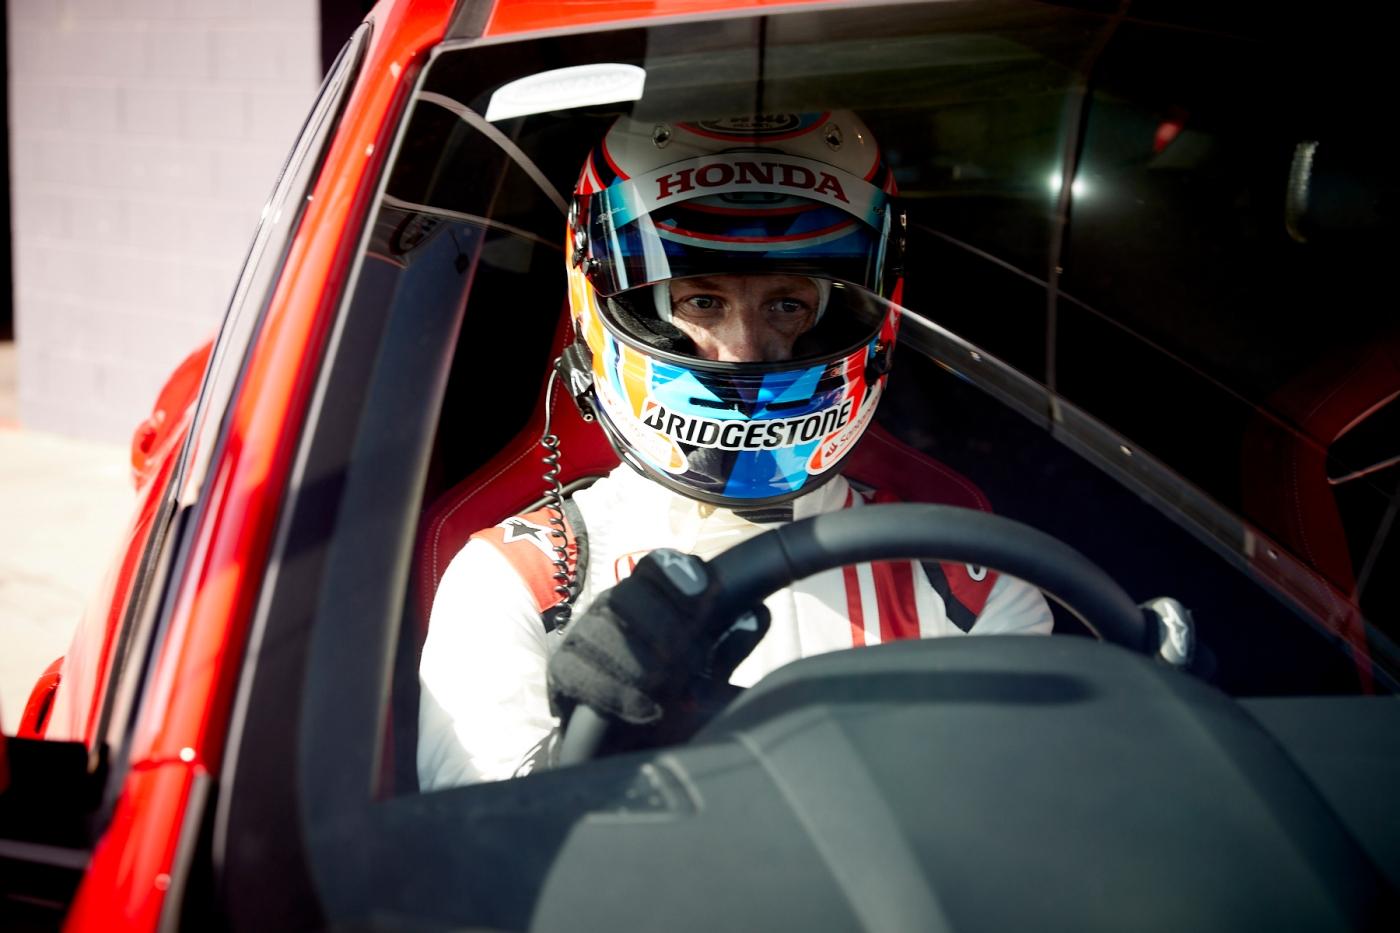 Jenson_Button_Bathurst_Honda_Civic_Type_R_0001